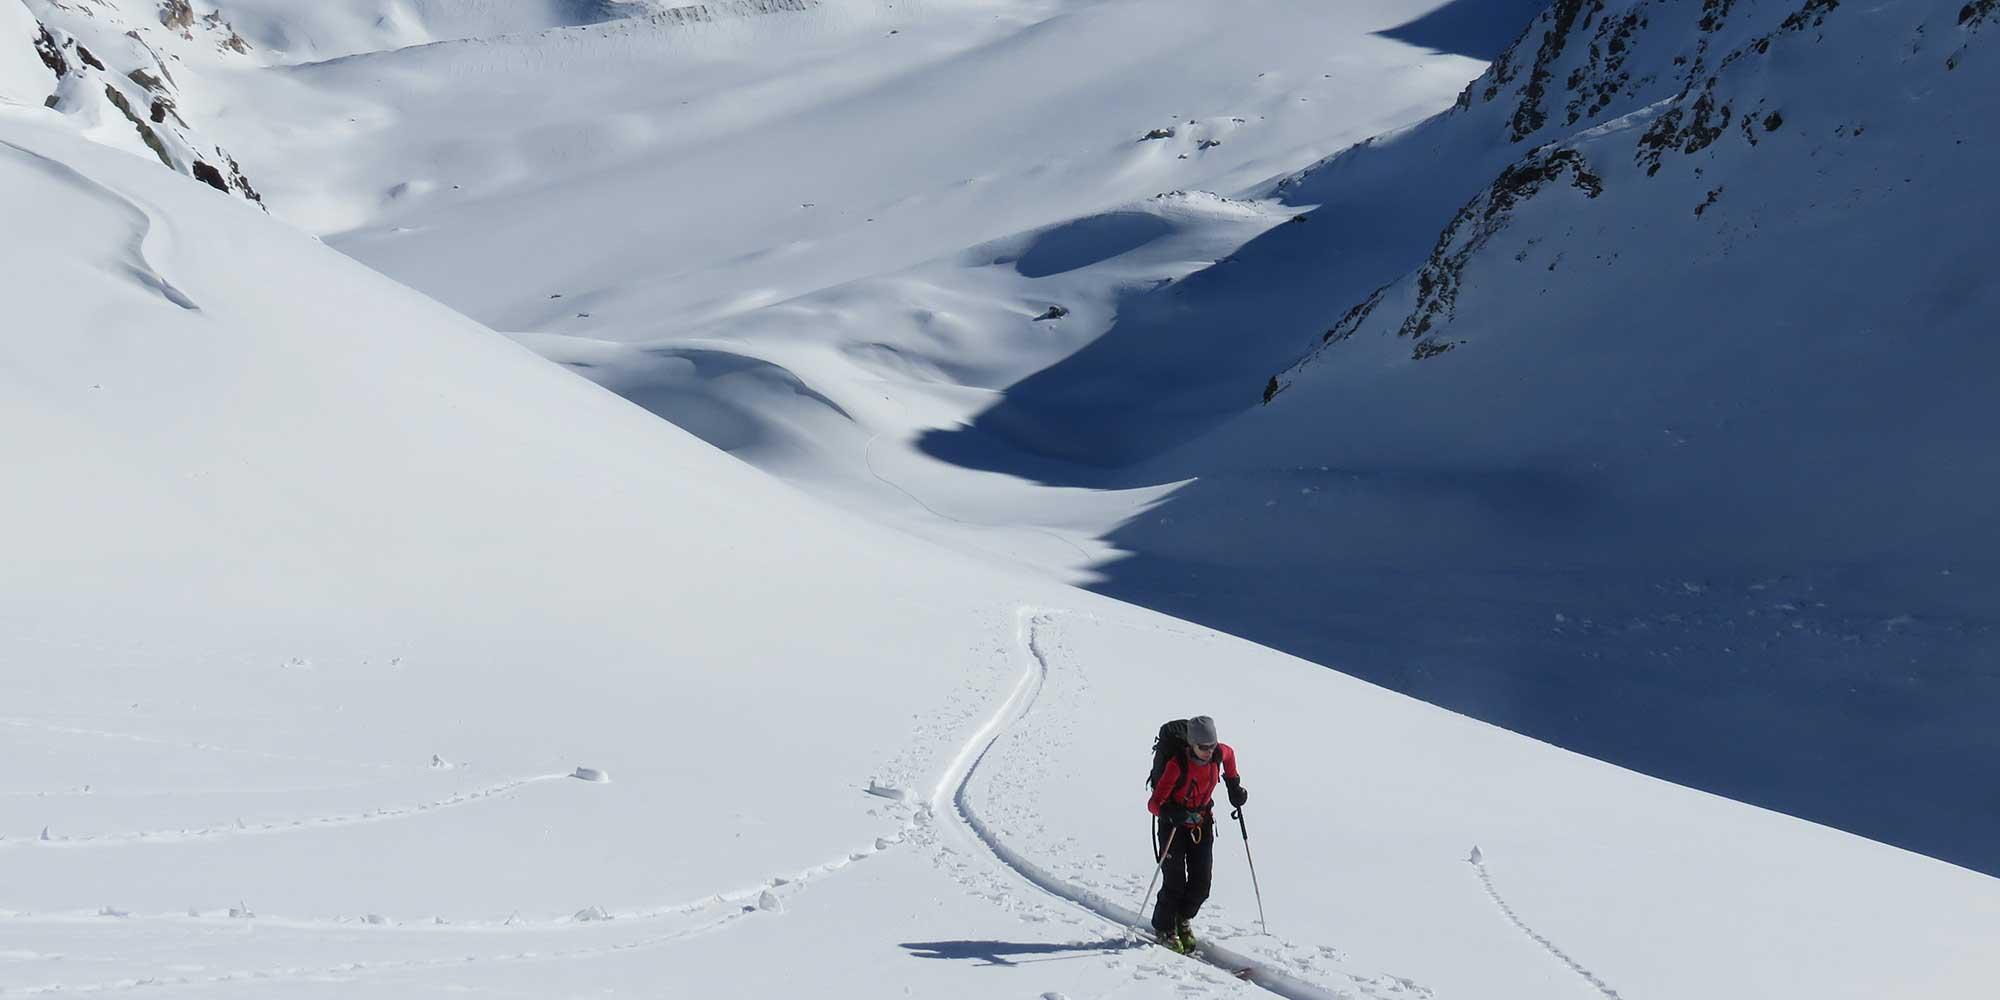 Galerie photos prosneige ski de randonnée